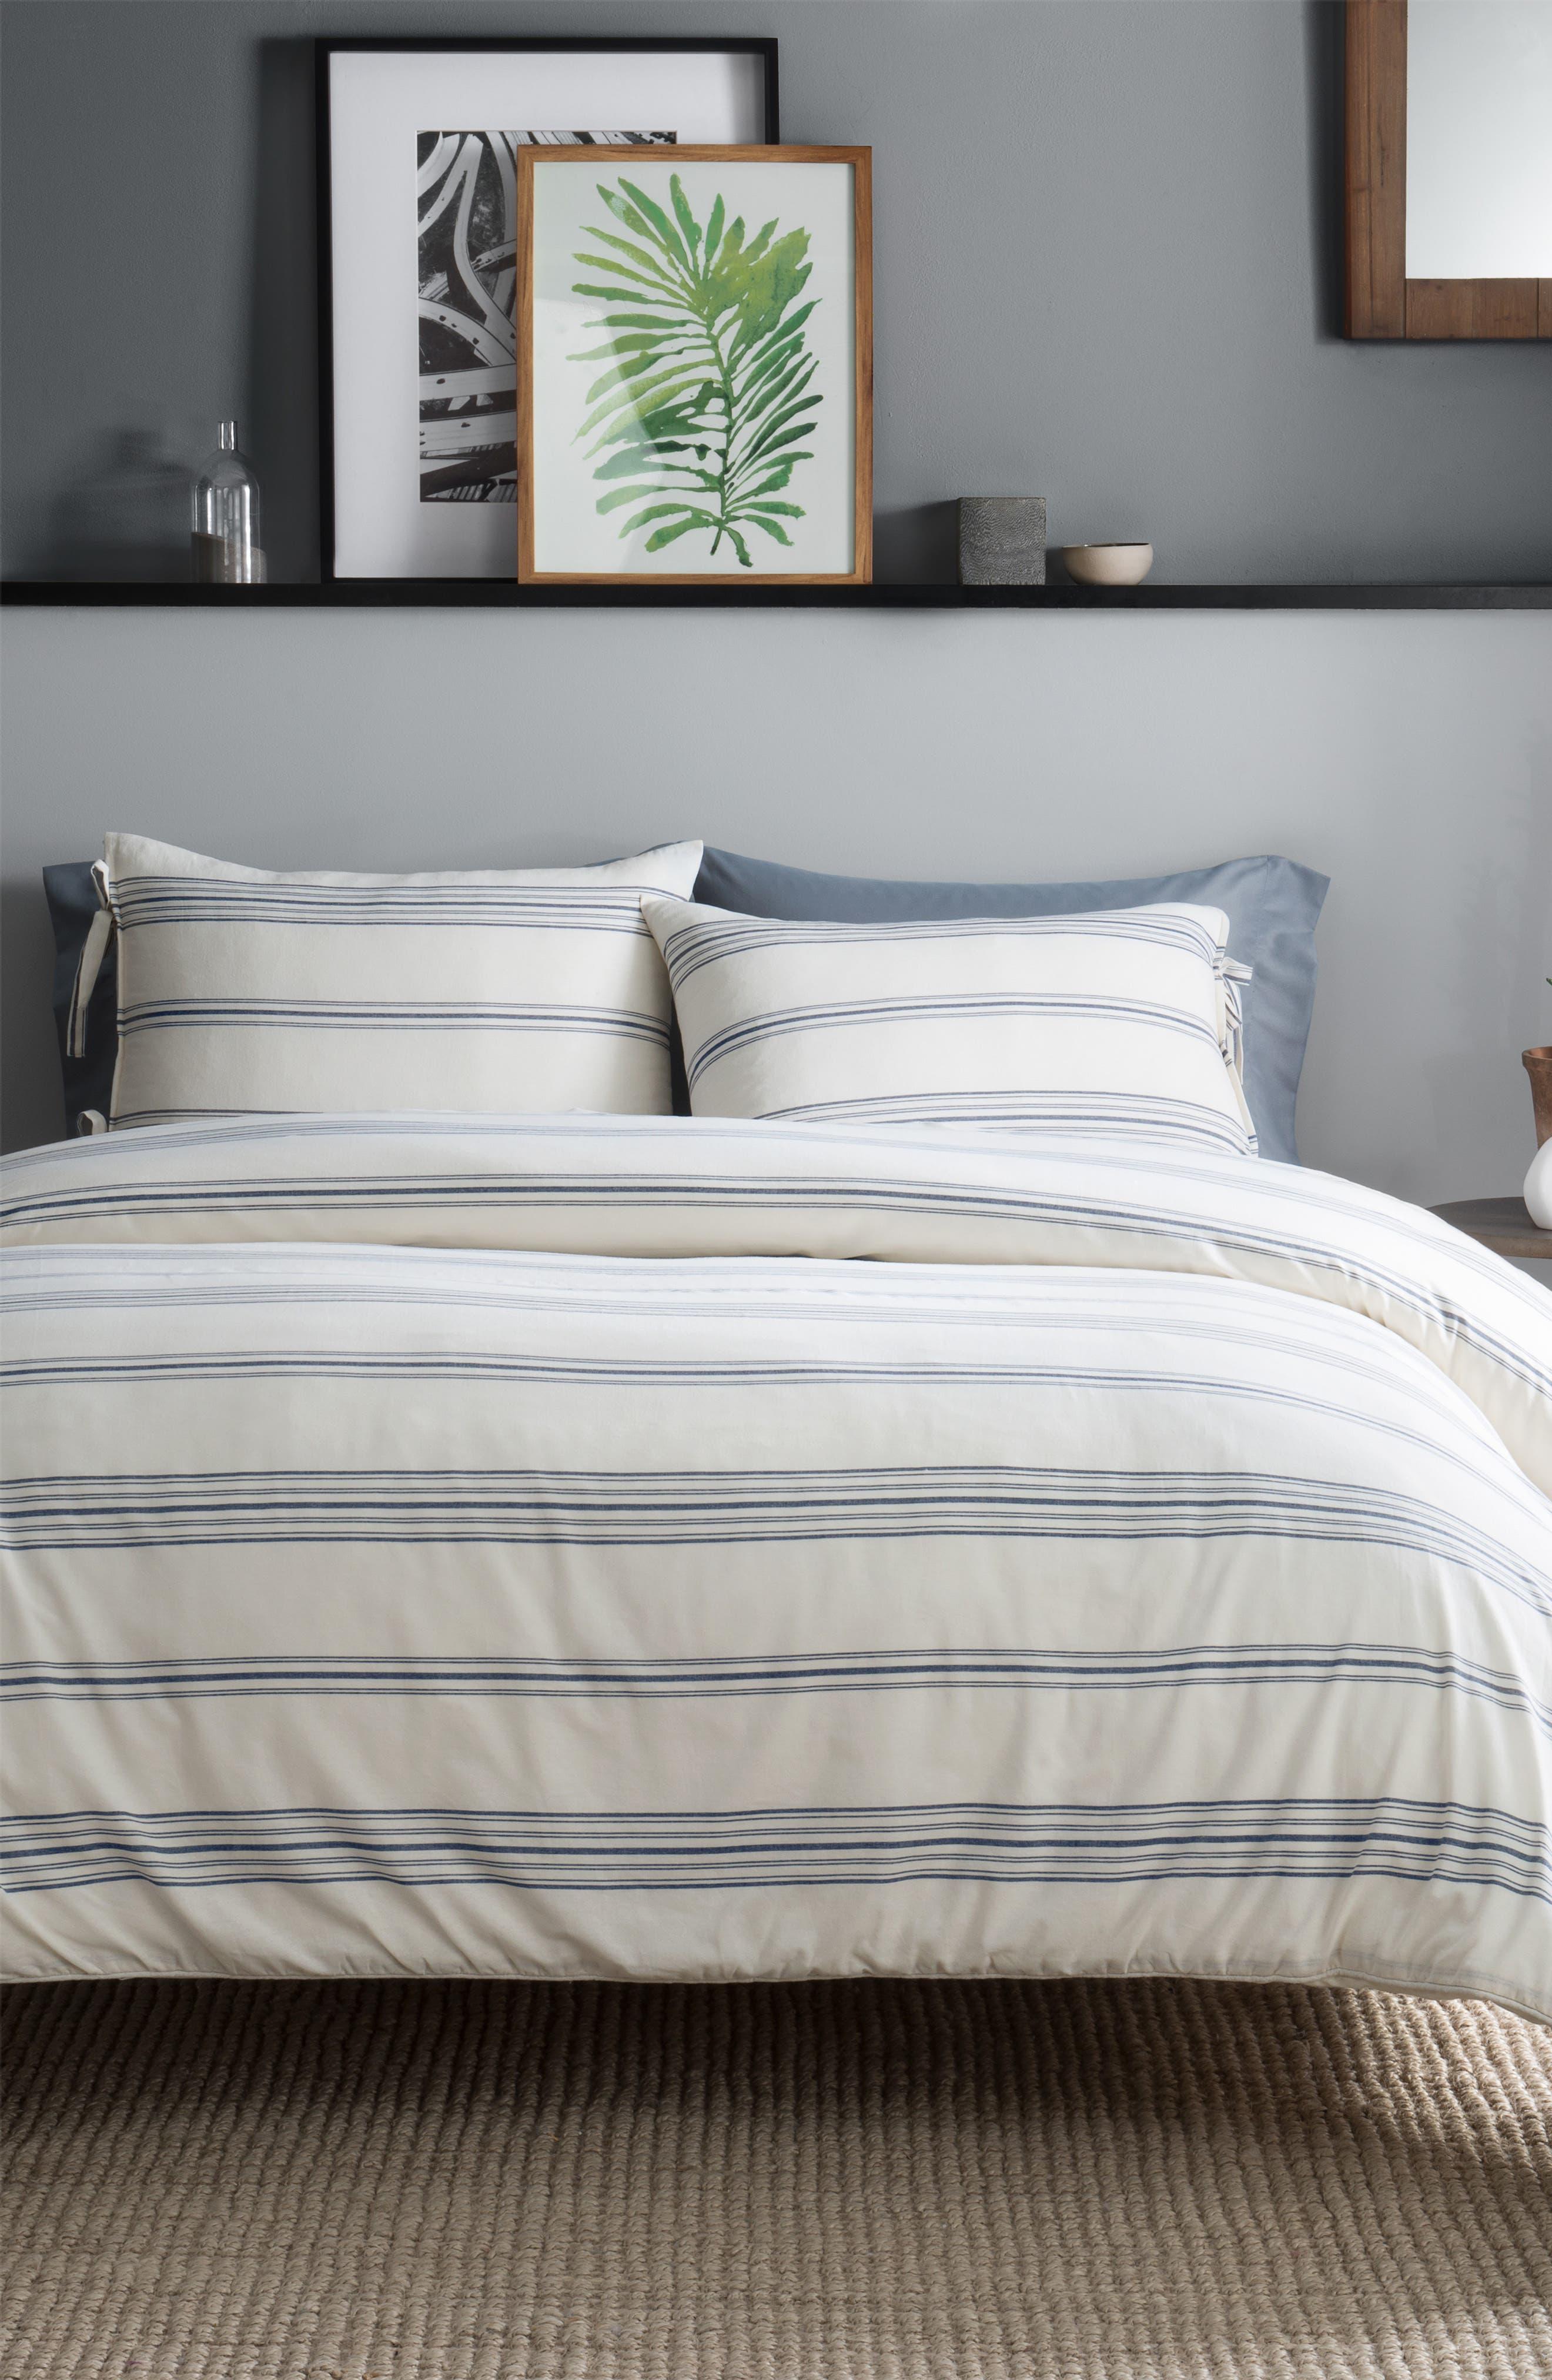 Ticking Stripe Duvet Cover & Sham Set, Main, color, 250